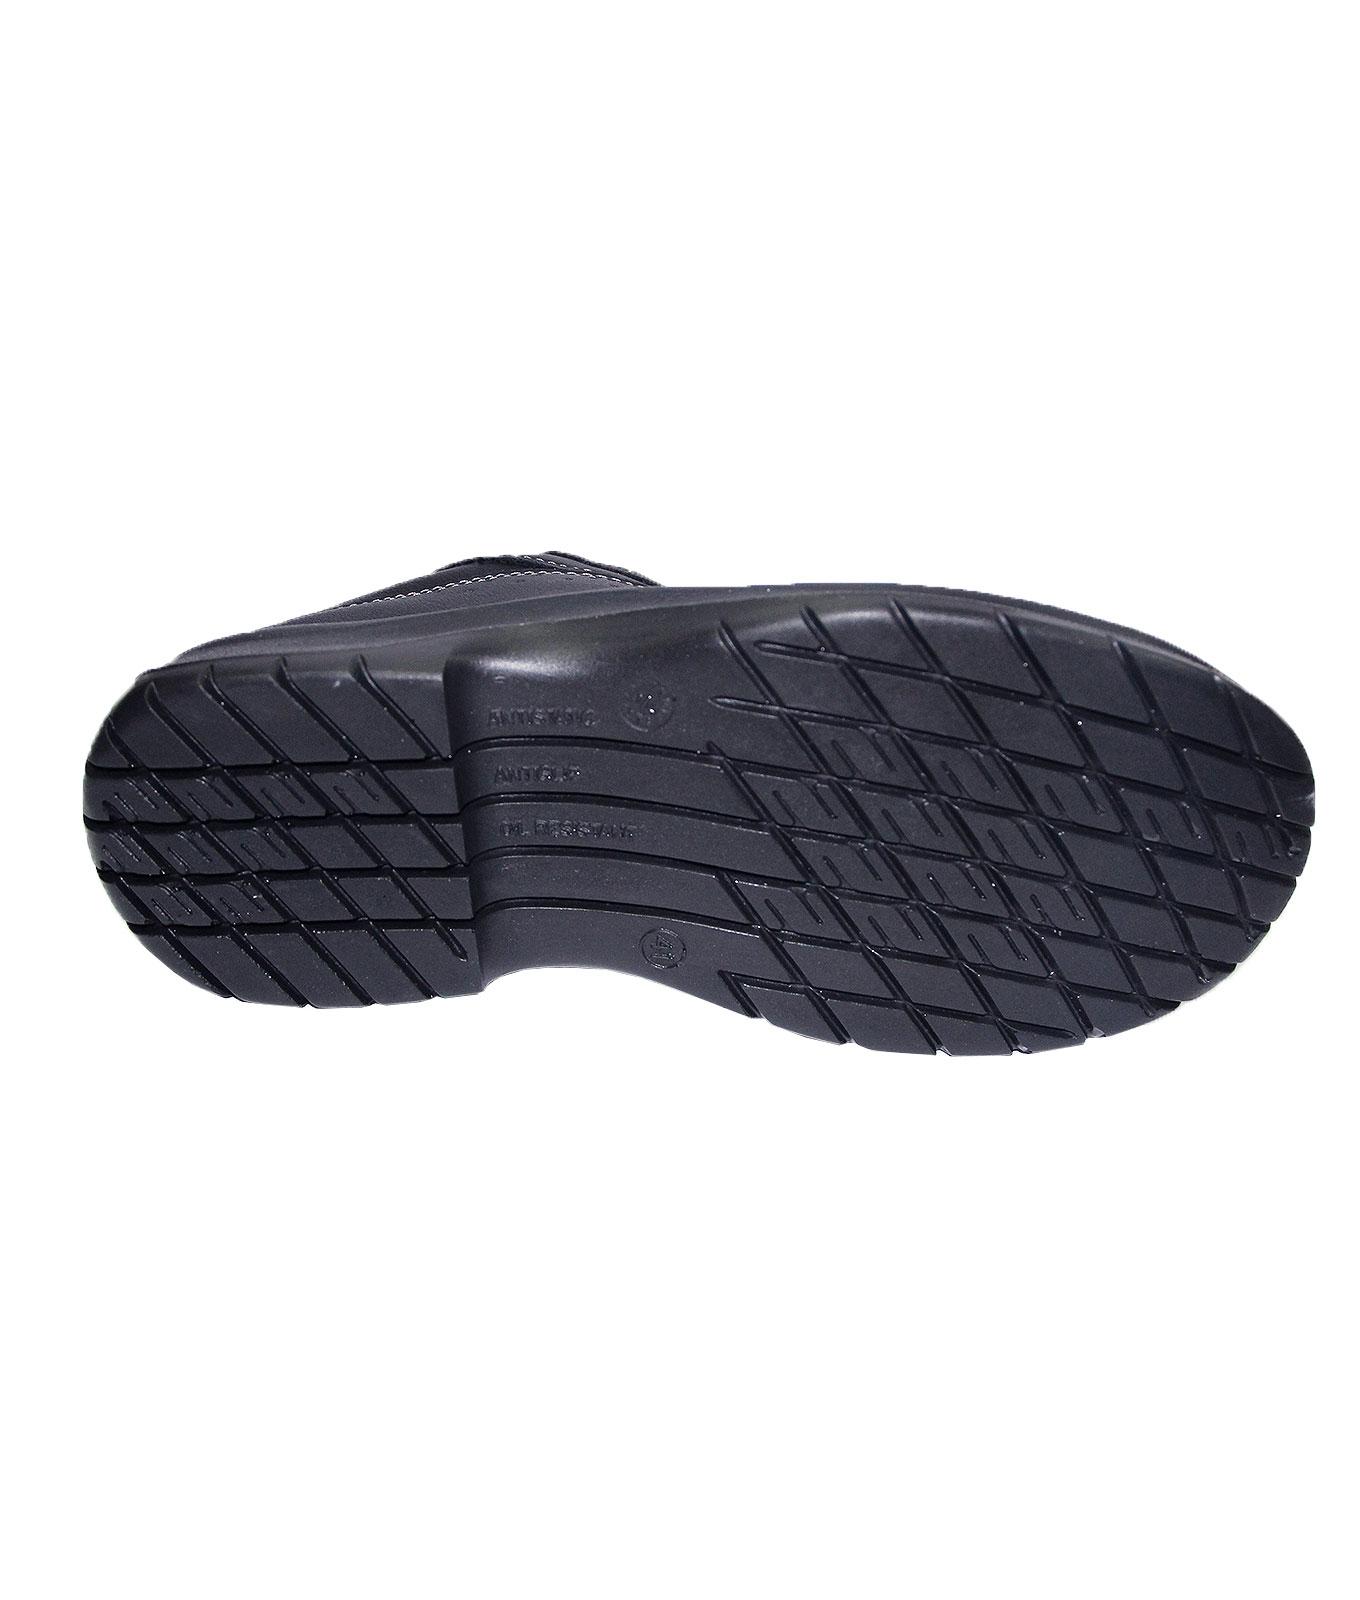 Derby: Εξαιρετικά ελαφριά παπούτσια εργασίας 5